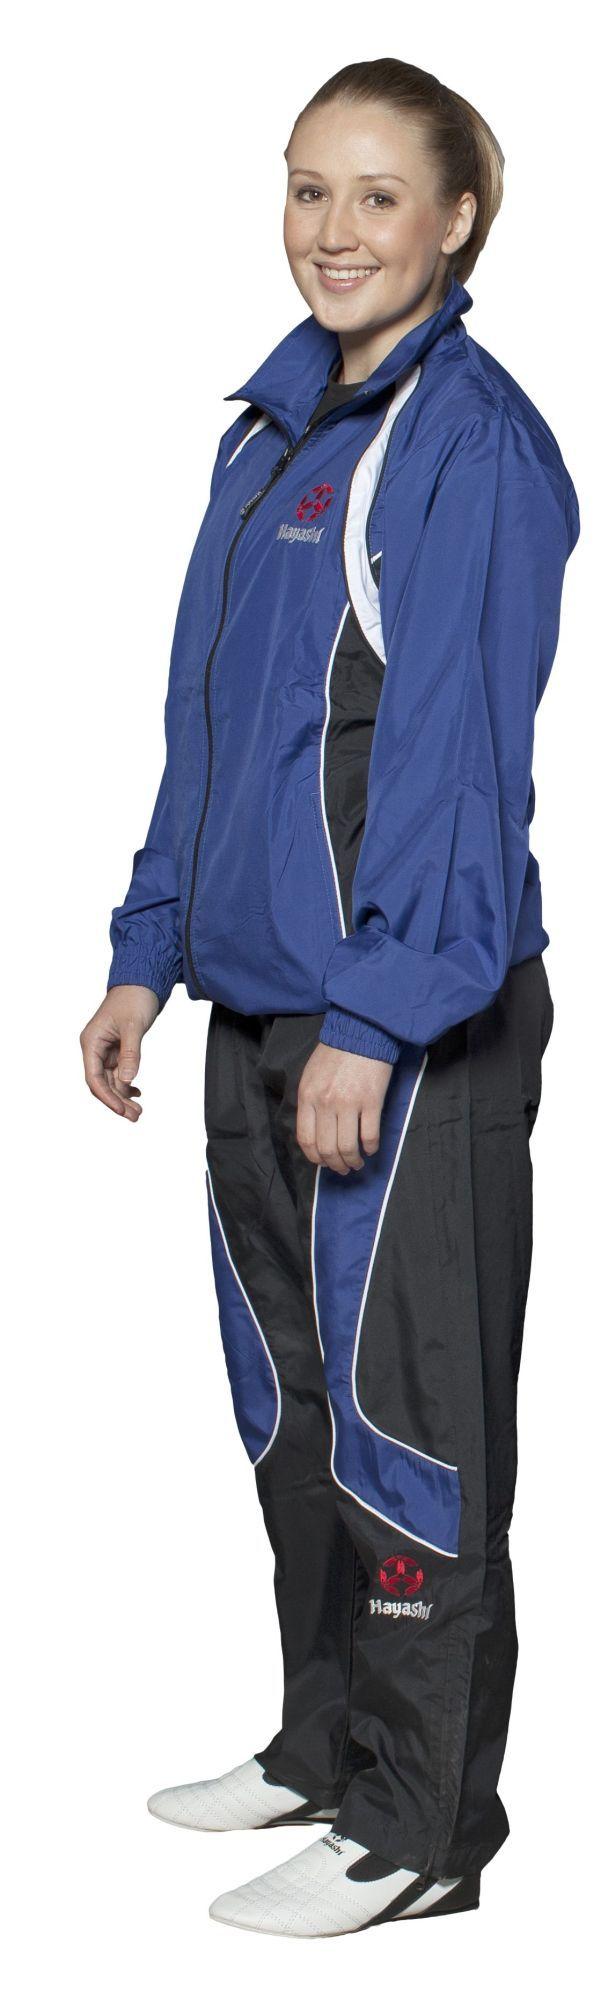 Hayashi Trainingspak Blauw - Zwart